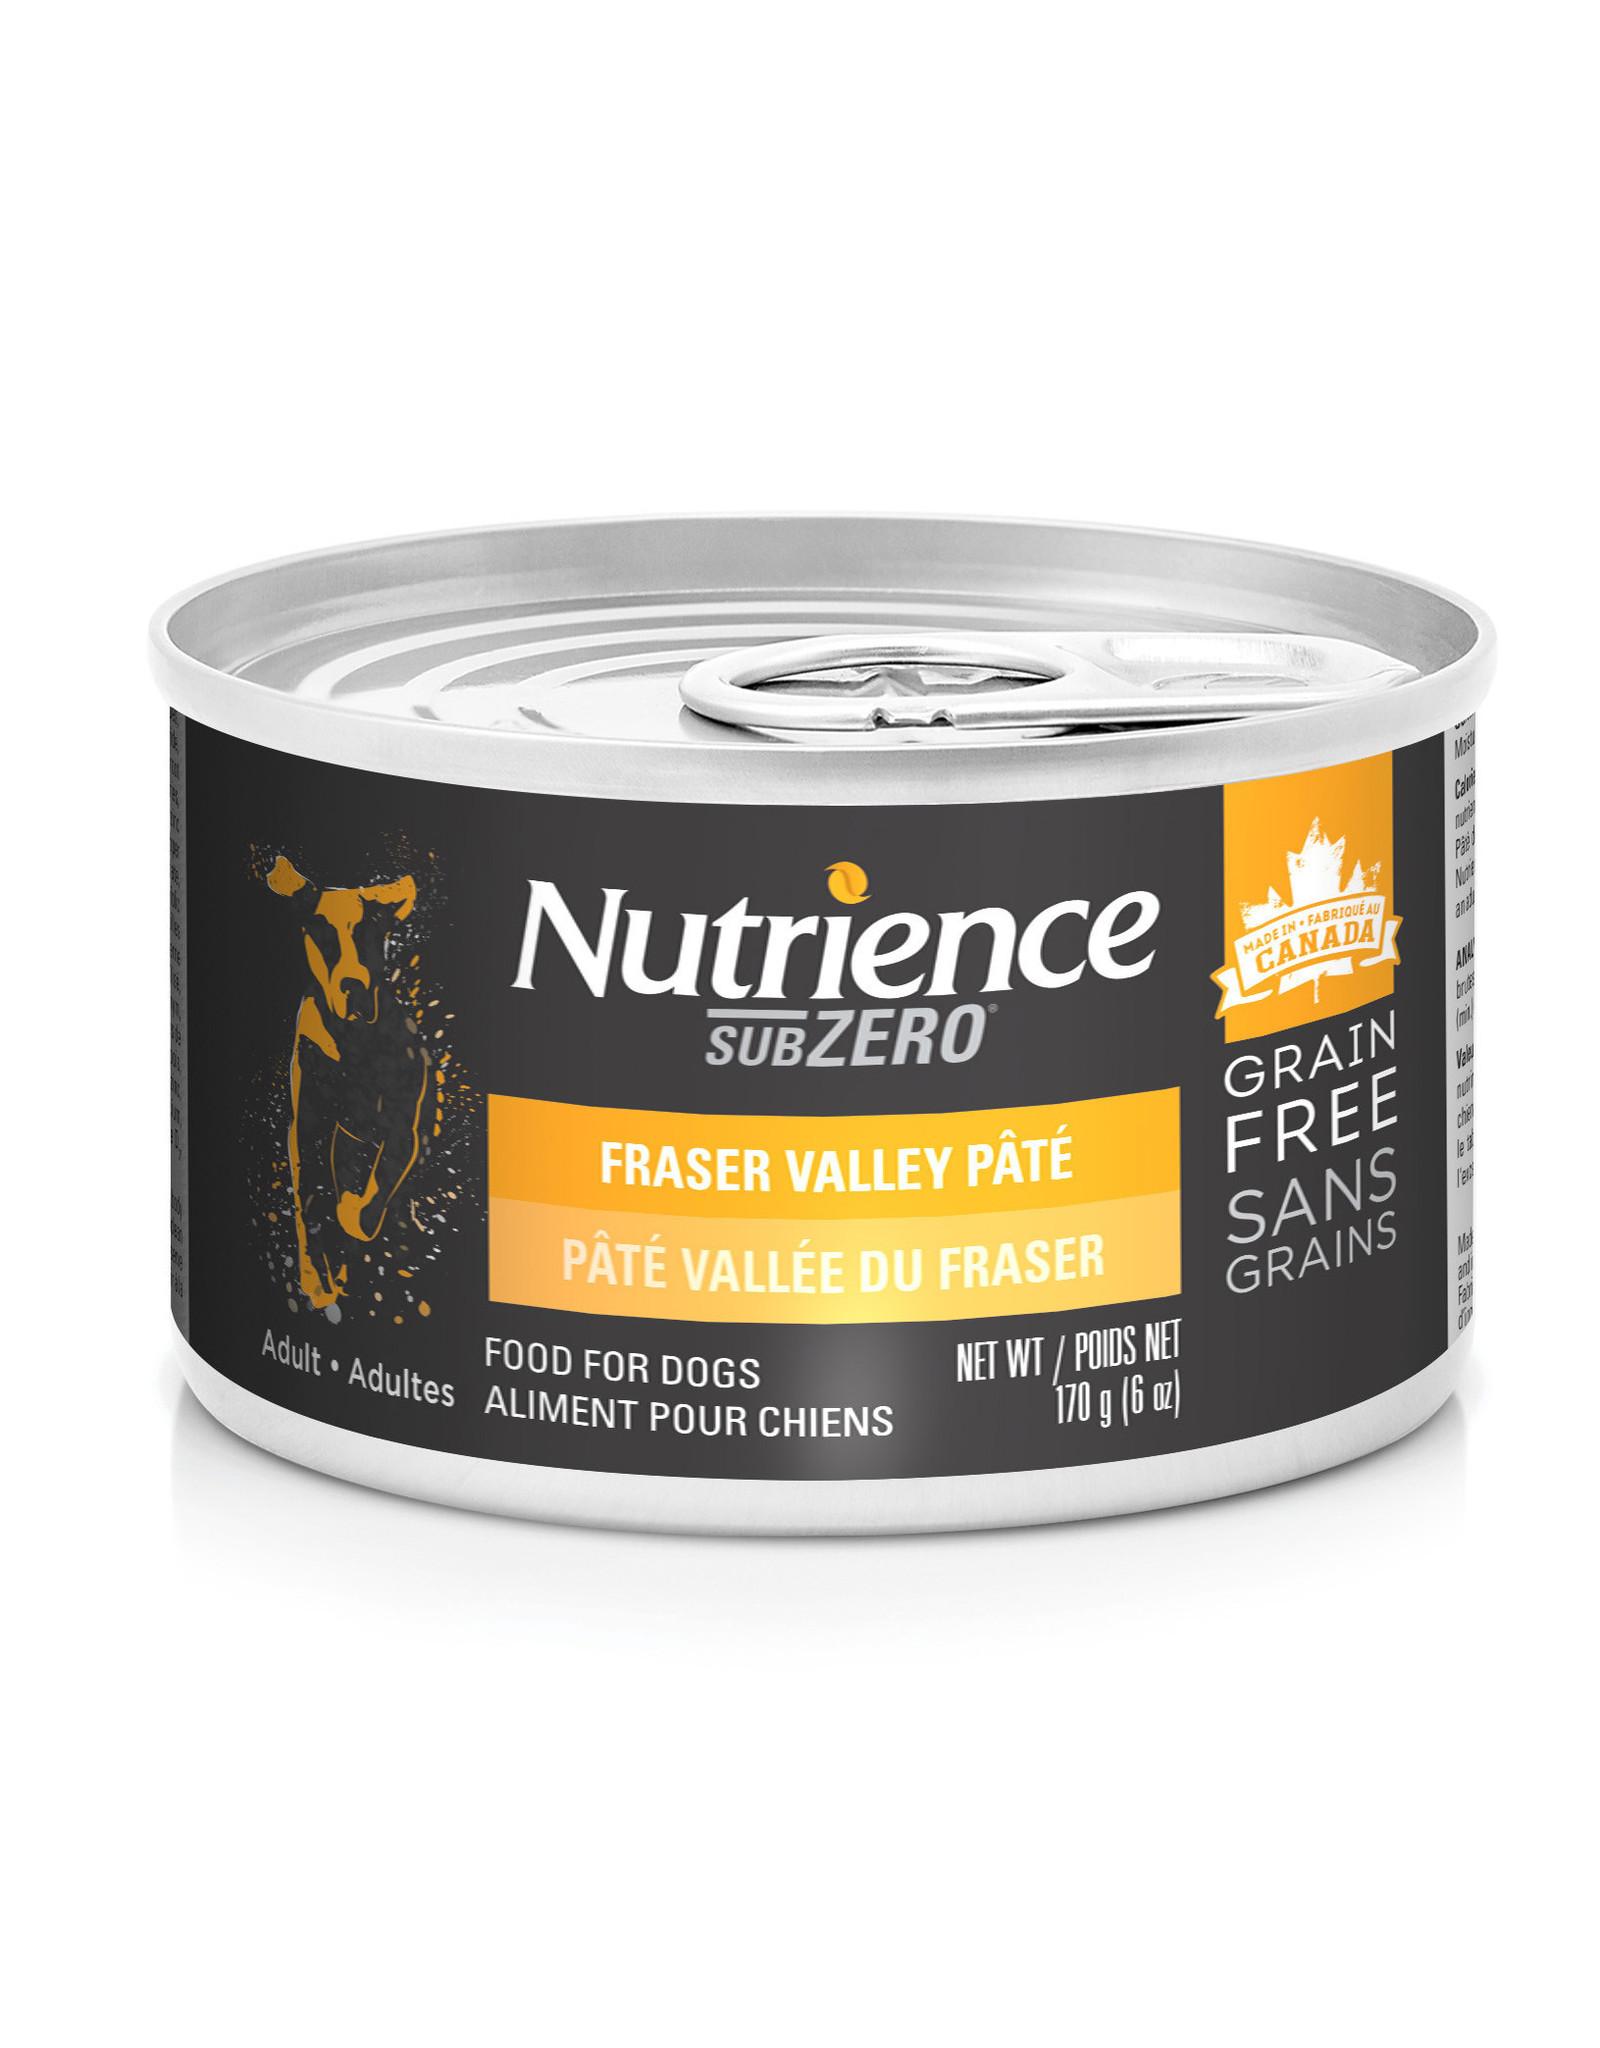 Nutrience Nutrience SubZero Pate Fraser Valley - 170g